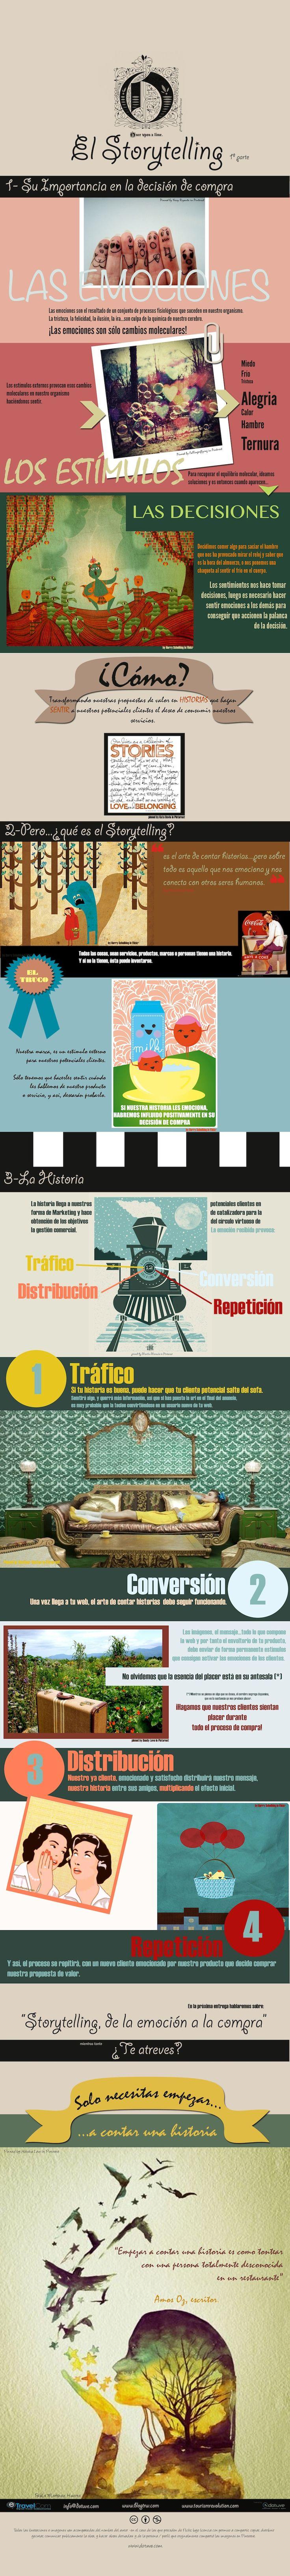 #Infografia Storytelling aplicado al marketing http://blog.publicube.es/2014/07/storytelling-aplicado-al-marketing.html